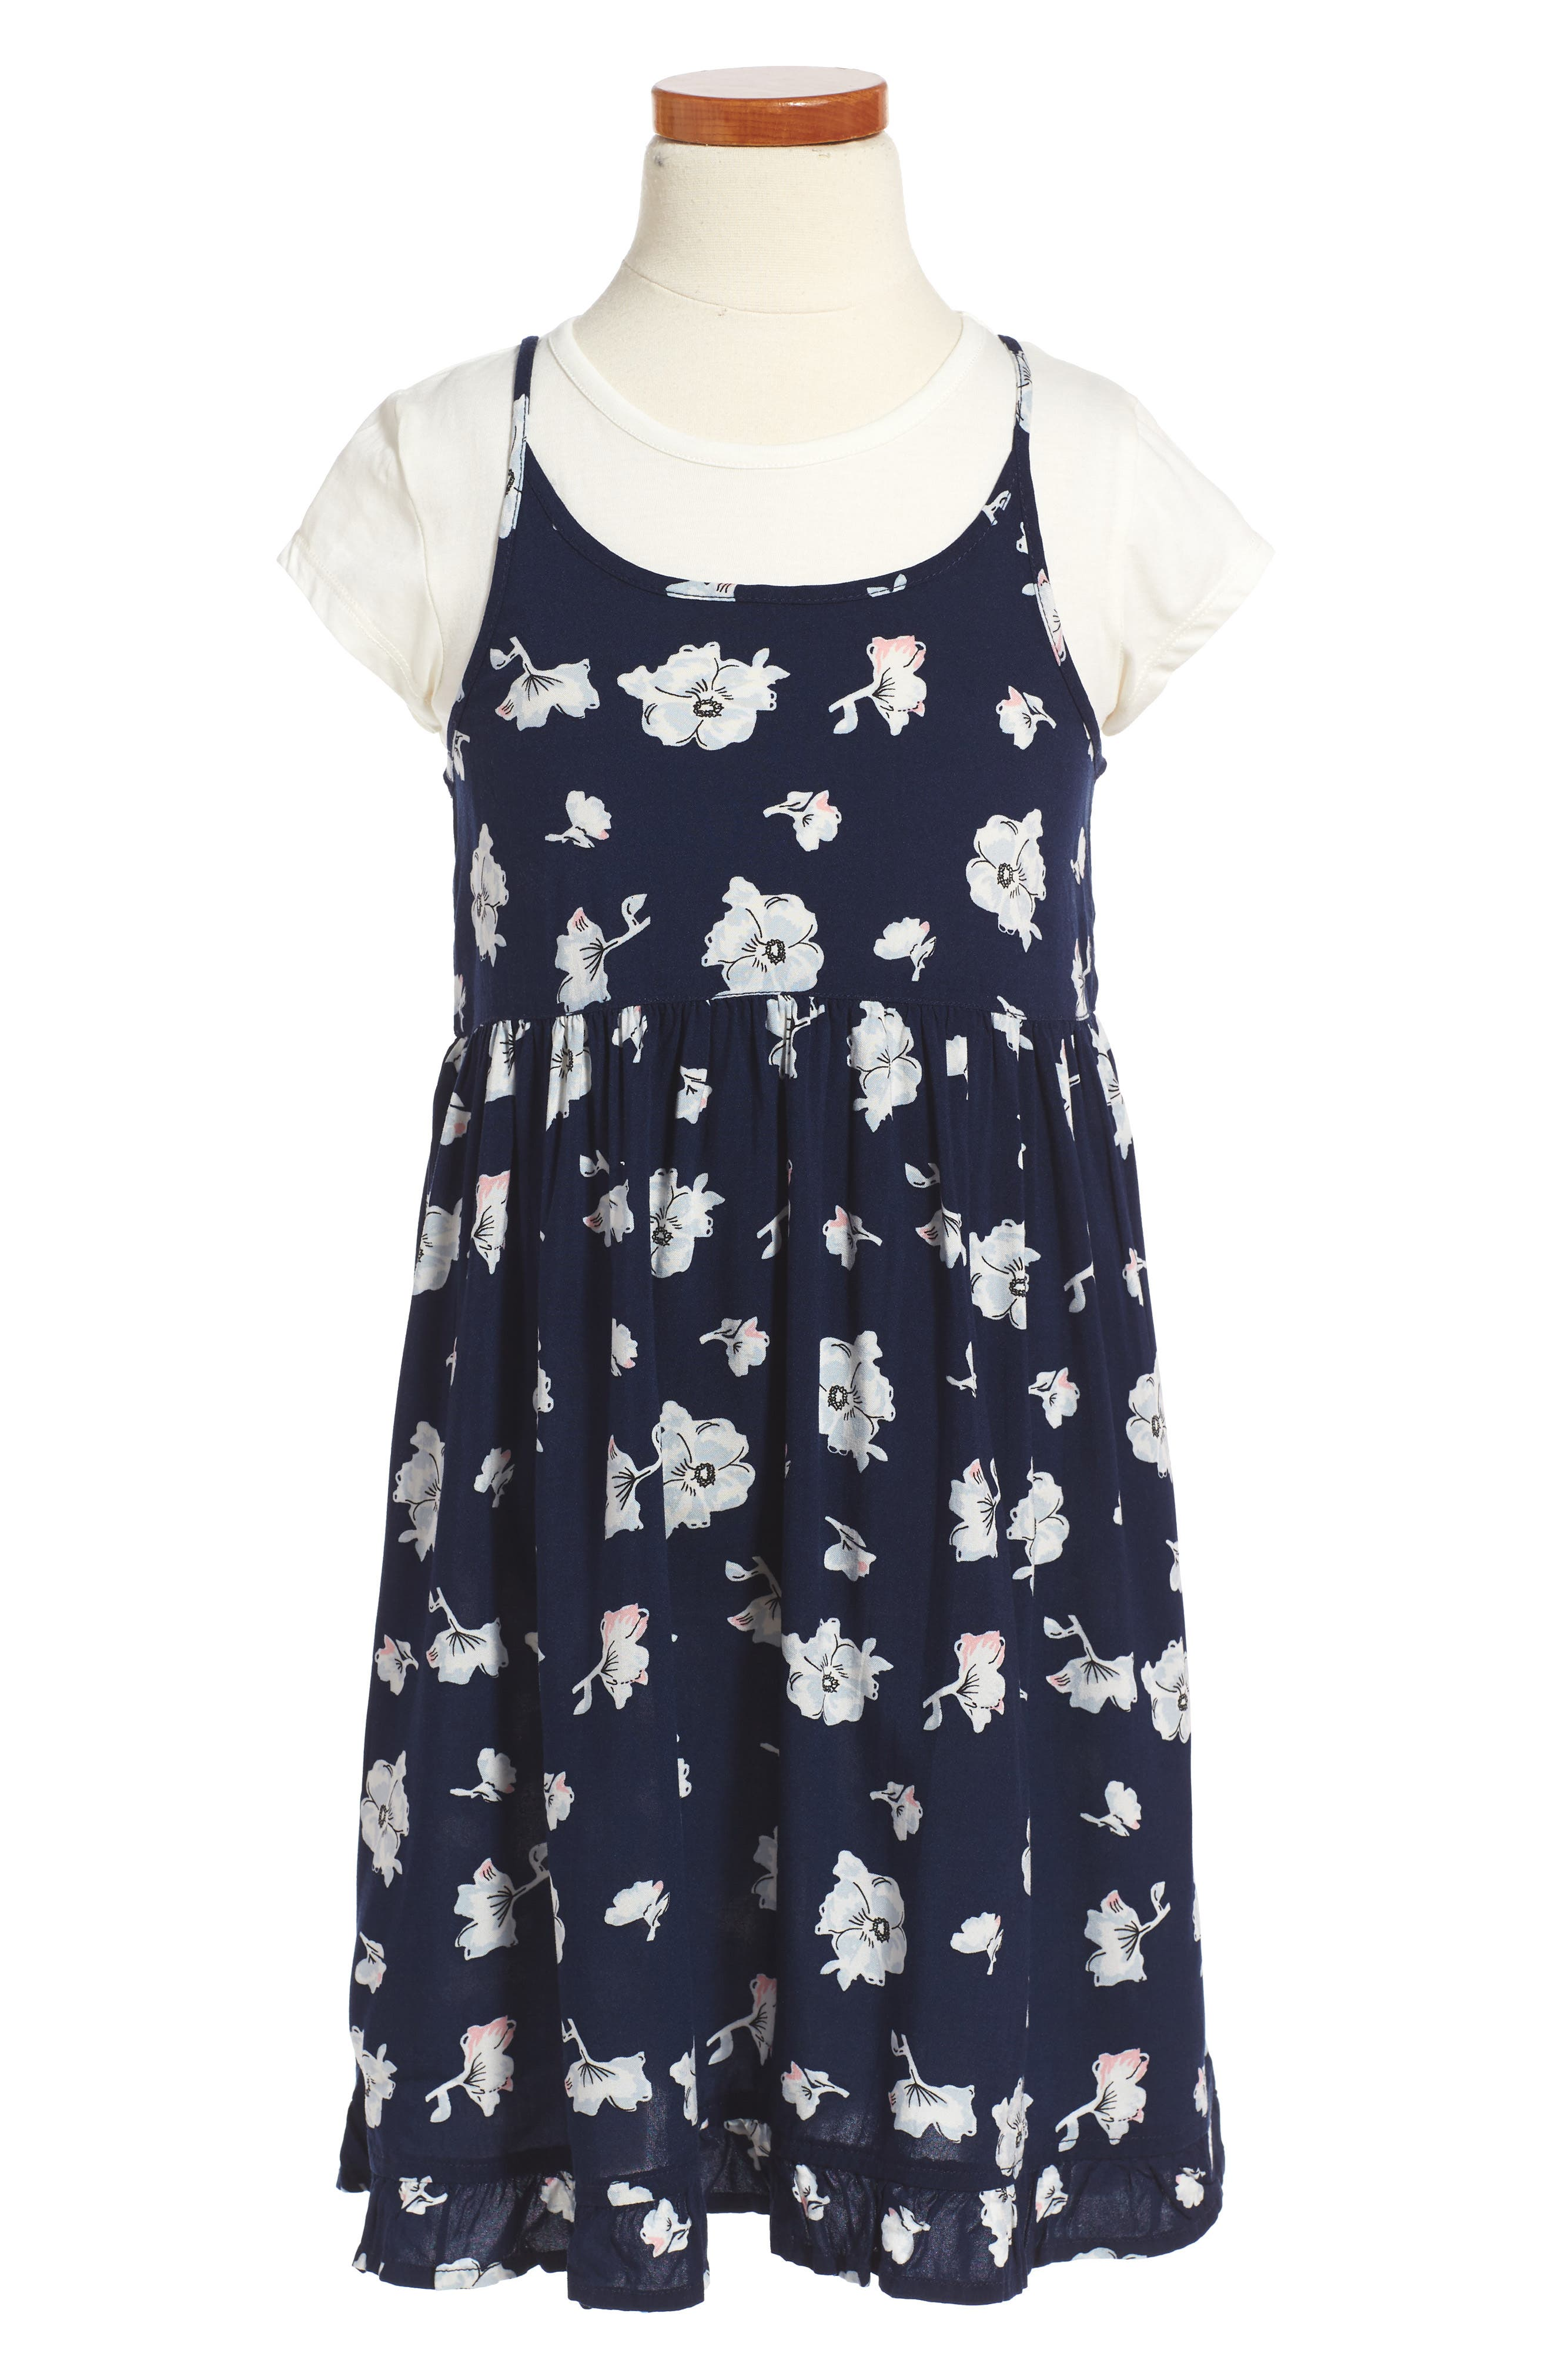 Main Image - Tucker + Tate Easy Tee & Dress Set (Toddler Girls, Little Girls & Big Girls)